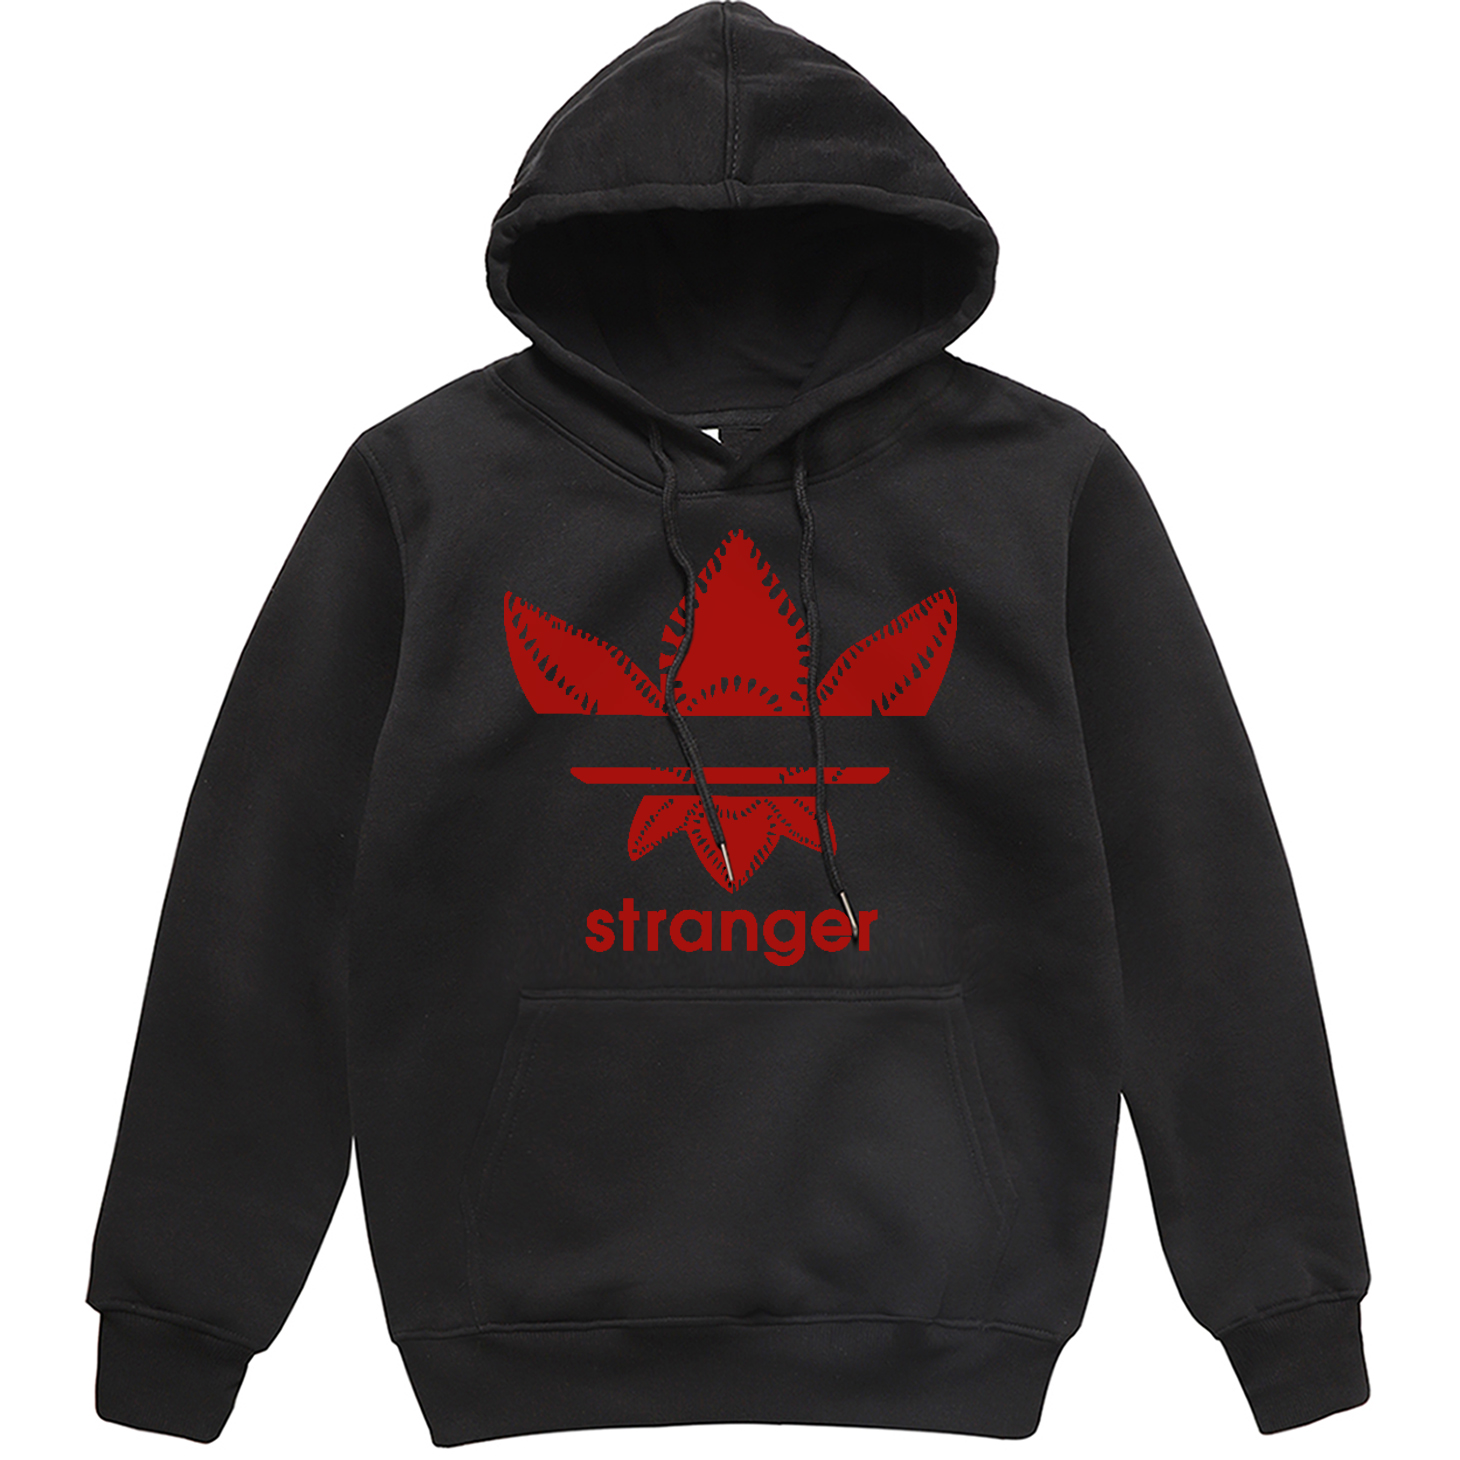 Stranger Things Season 3 Hoodies Men Autumn Winter Fleece Warm Hooded Sweatshirt Male 2019 Hot Streetwear Men's Hoodie Harajuku